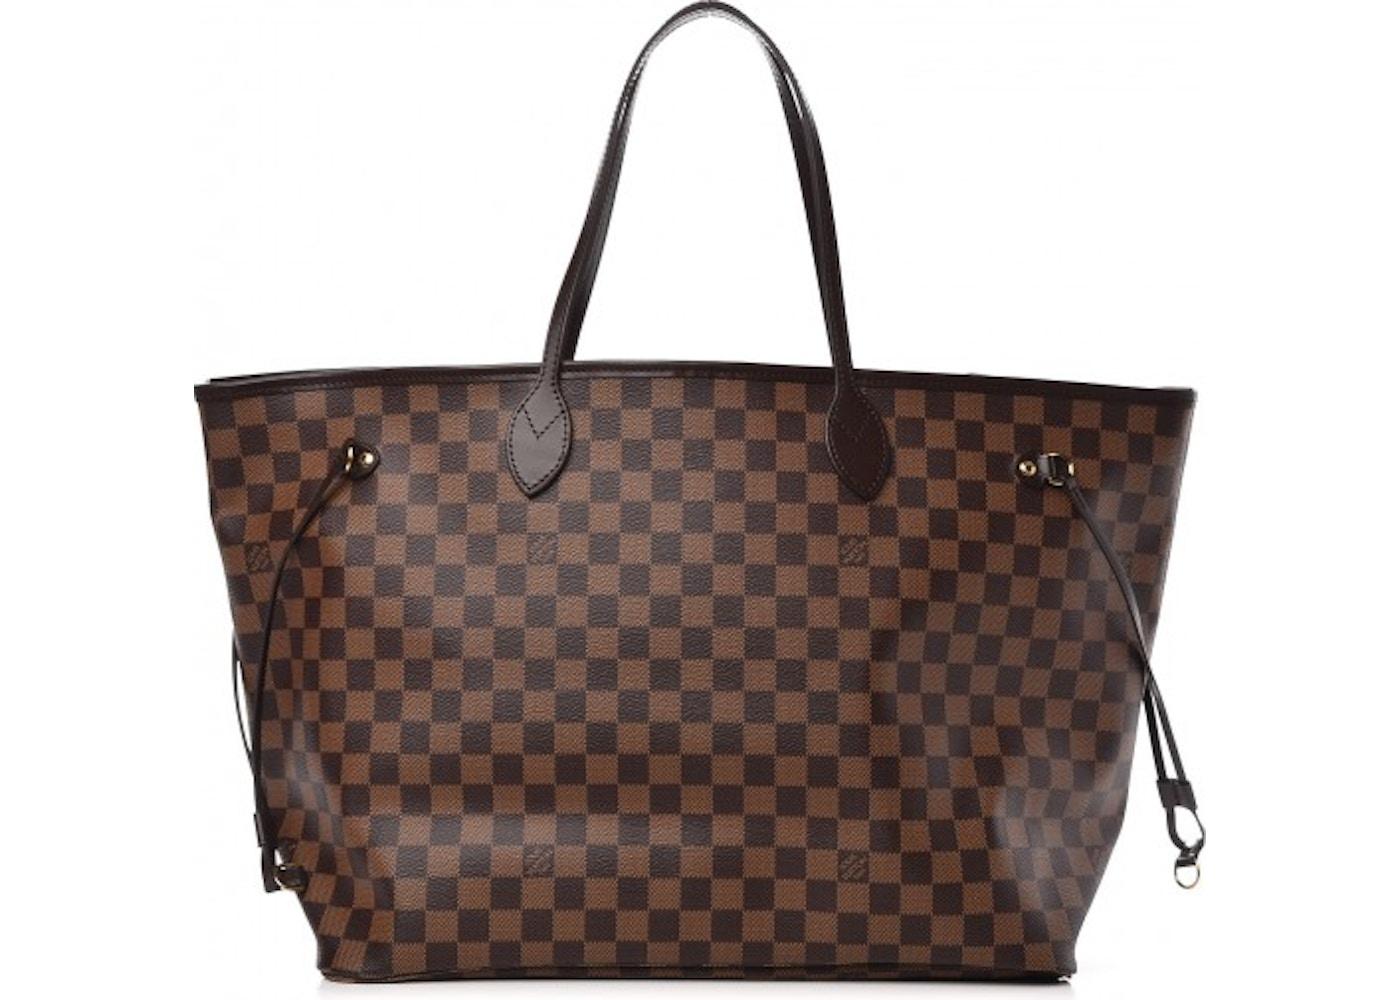 940517b05 Buy & Sell Louis Vuitton Neverfull Handbags